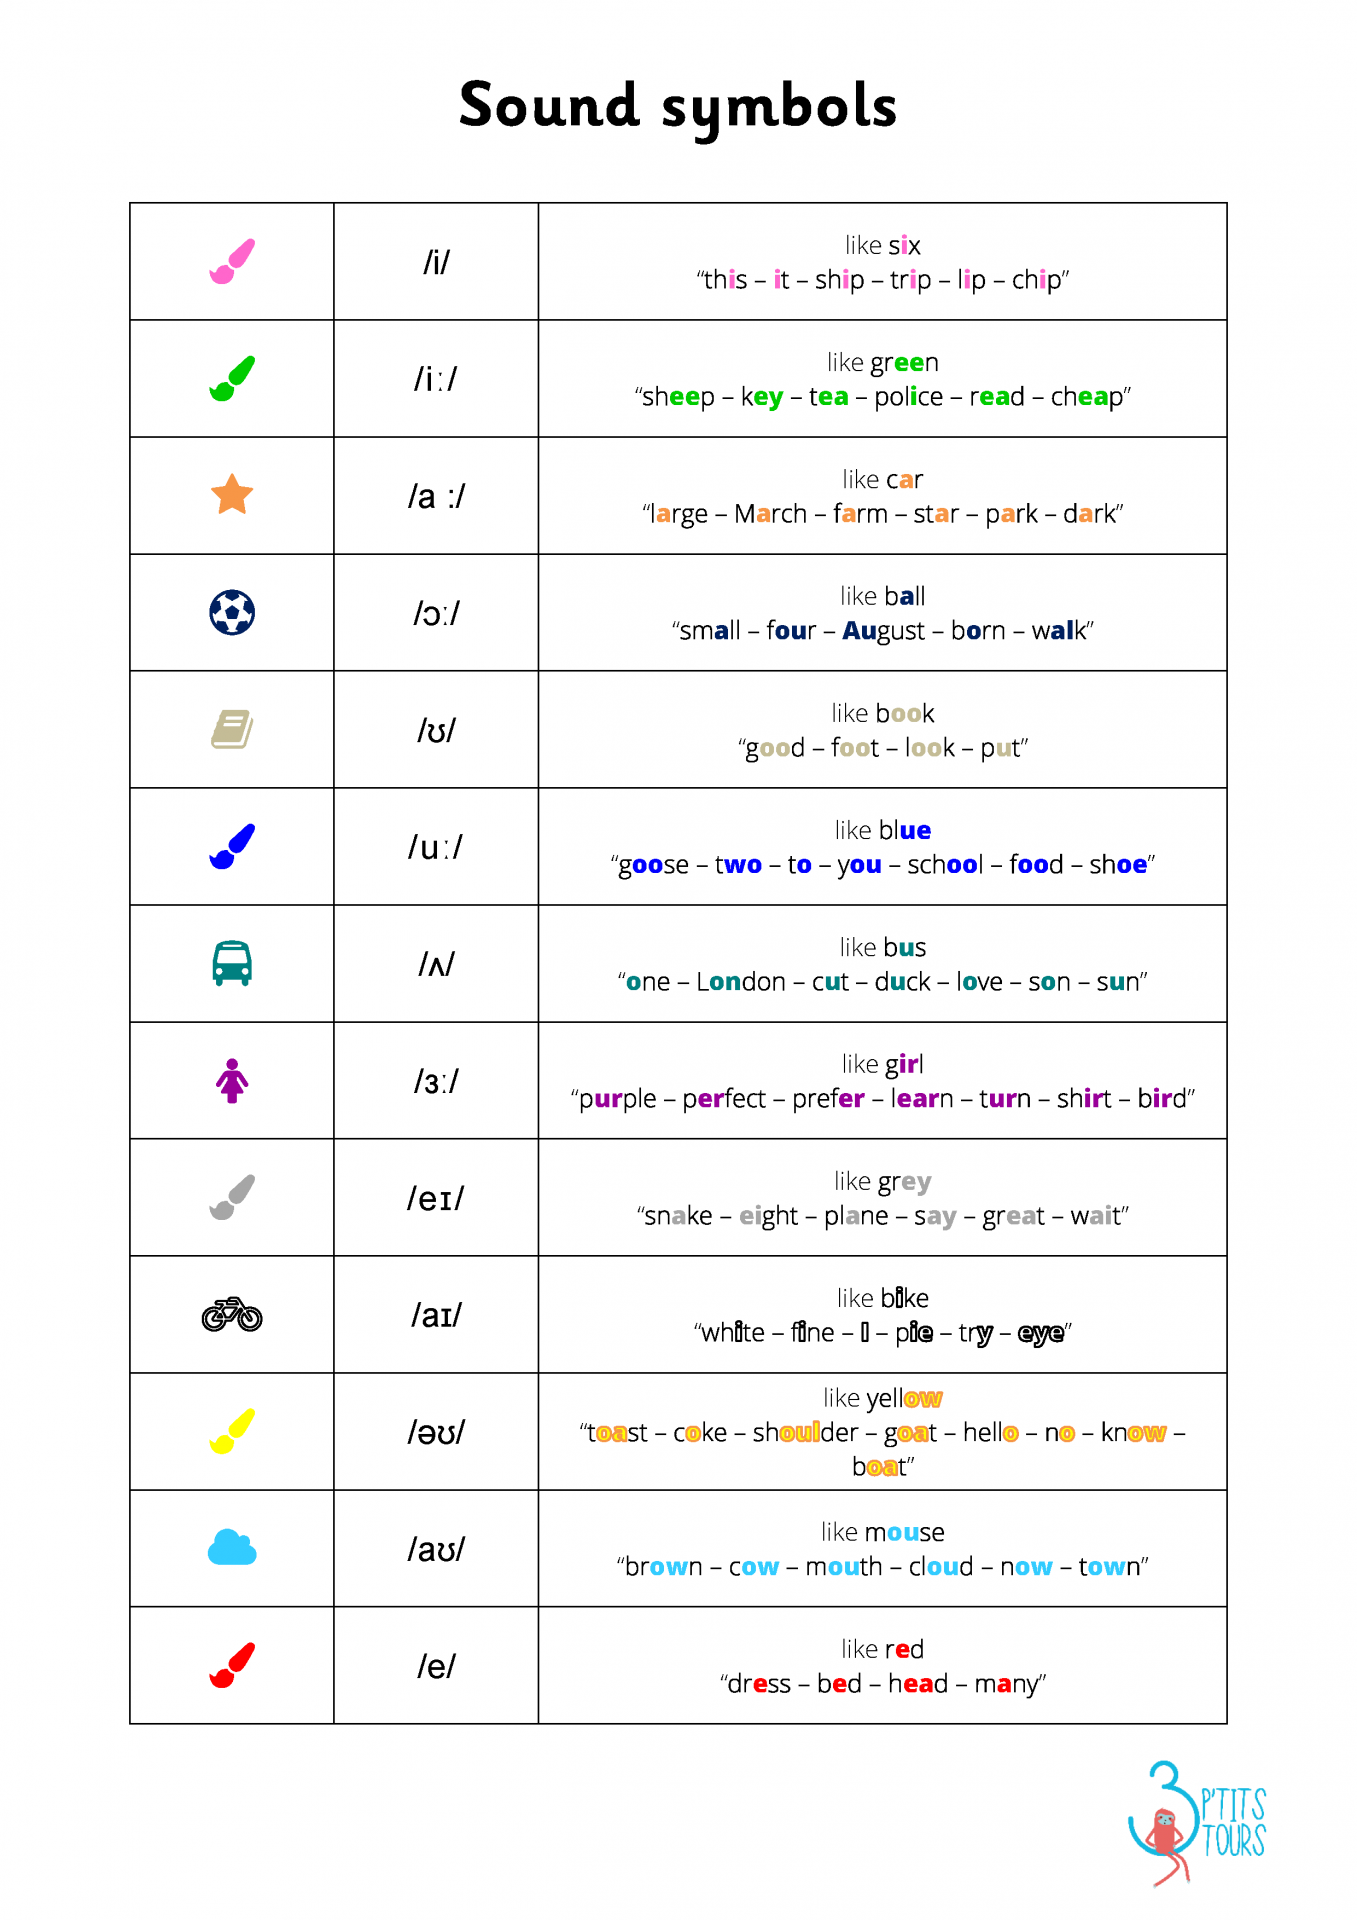 Sound symbols